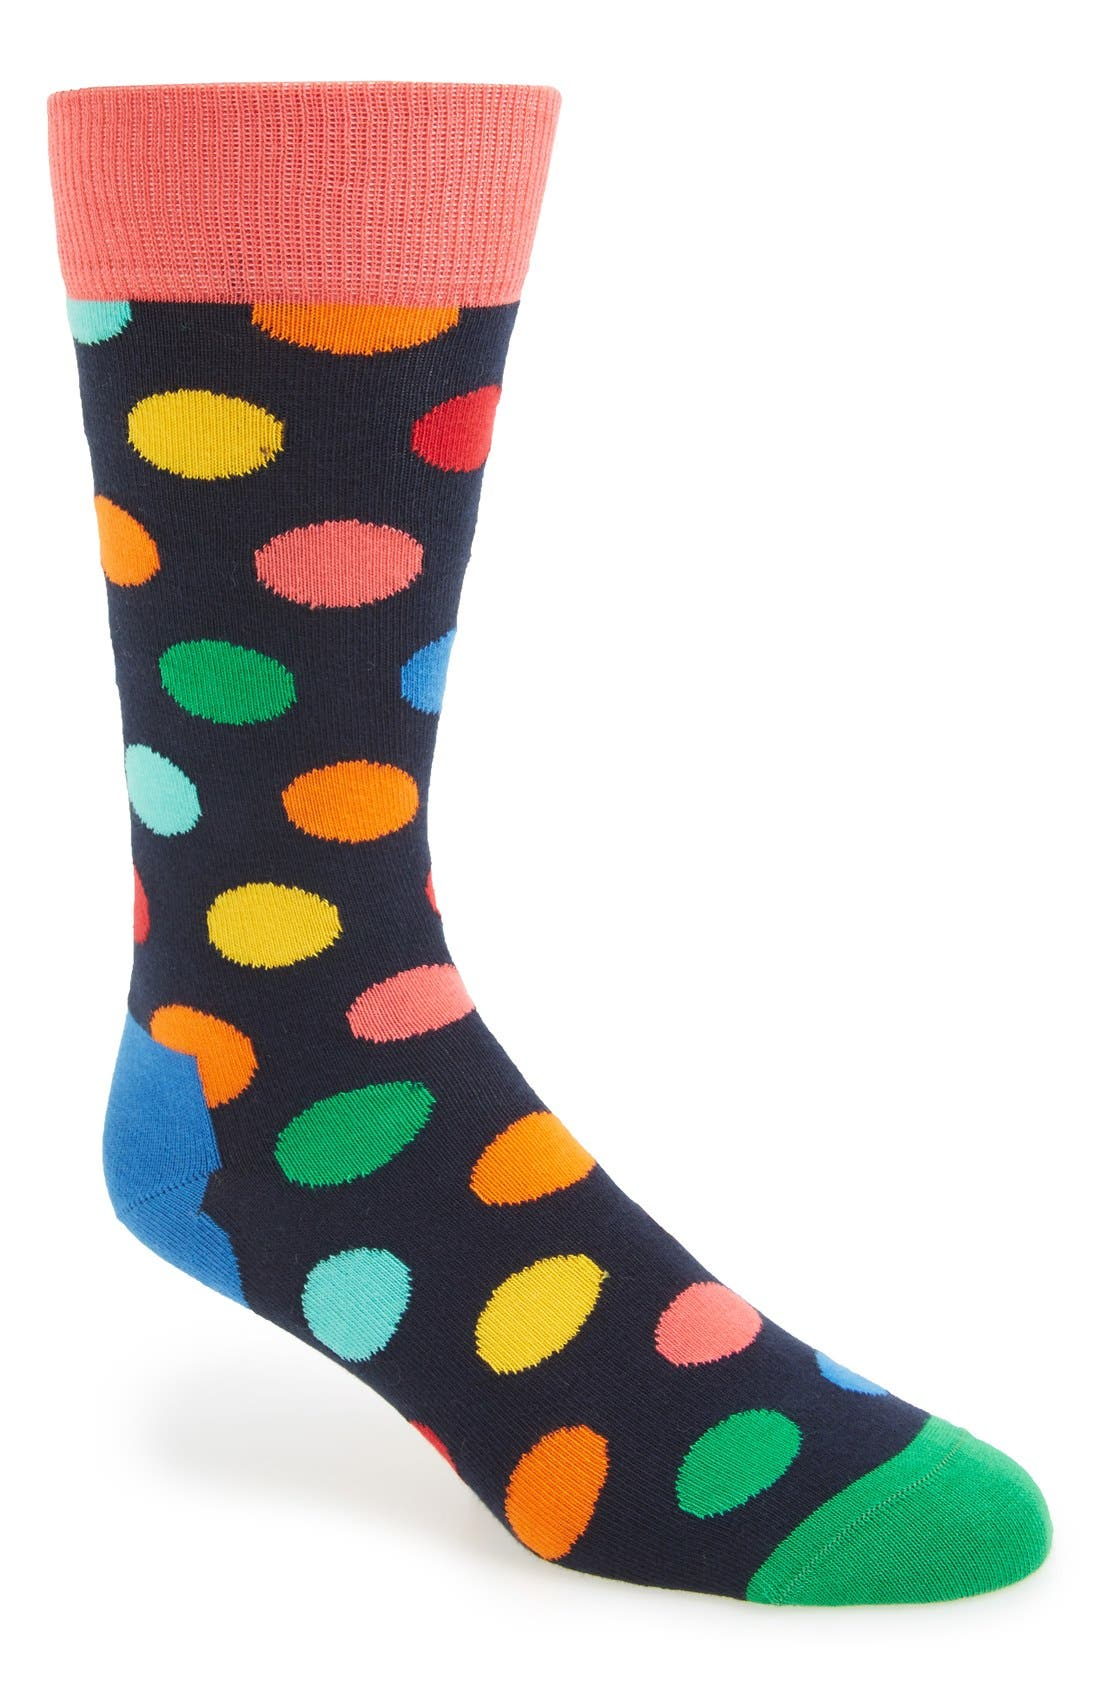 Polka Dot Cotton Blend Socks,                         Main,                         color, Blue/ Bright Combo